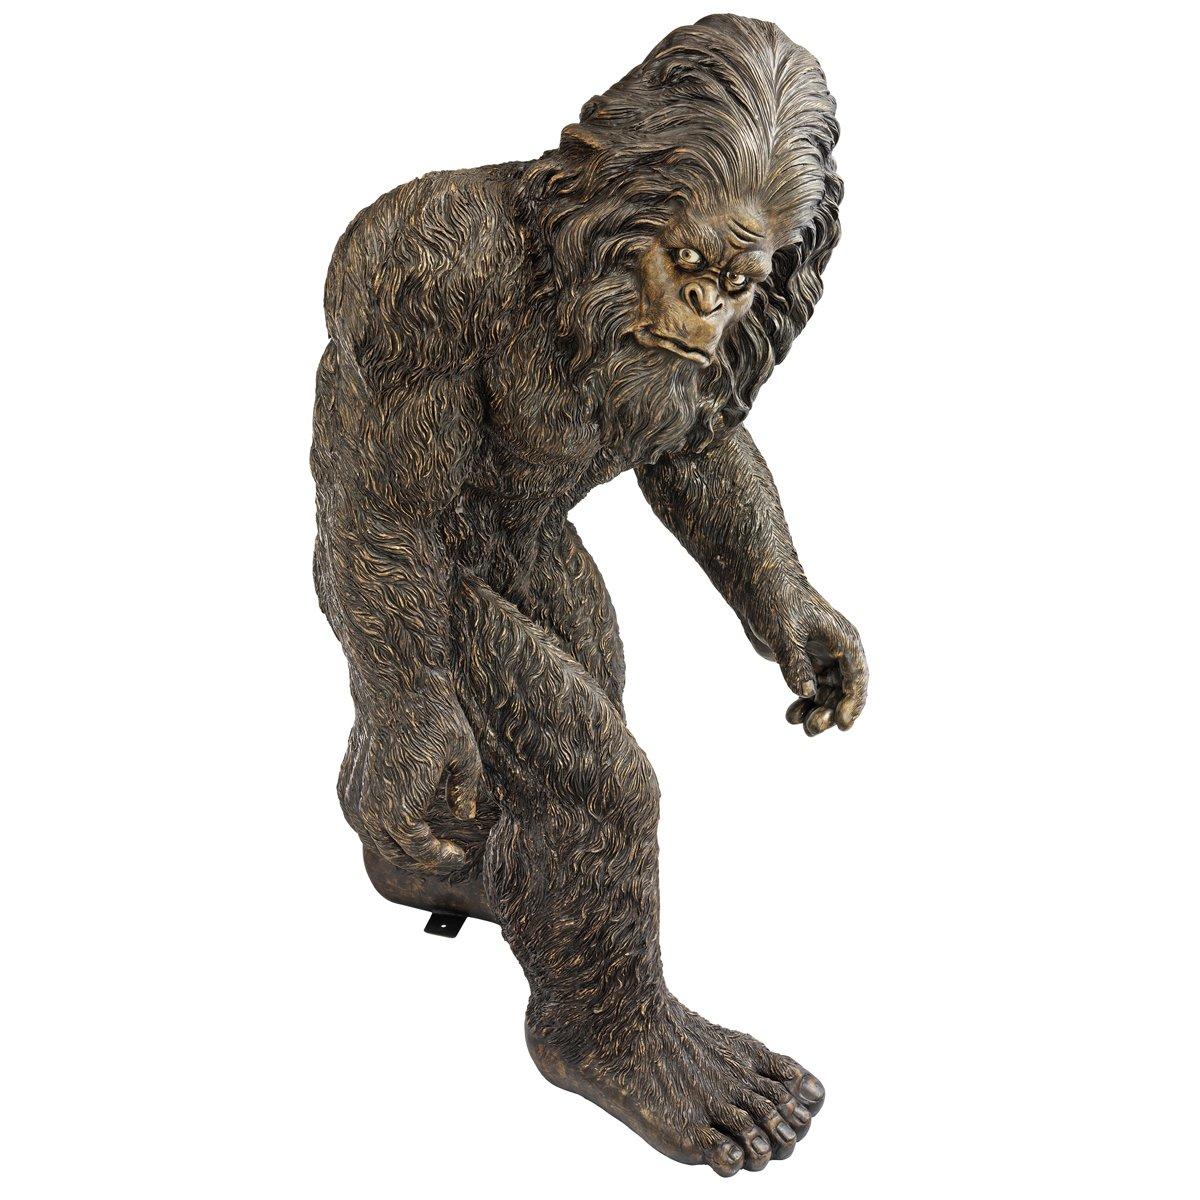 Amazon.com : Design Toscano Bigfoot the Giant Life-size Yeti ...